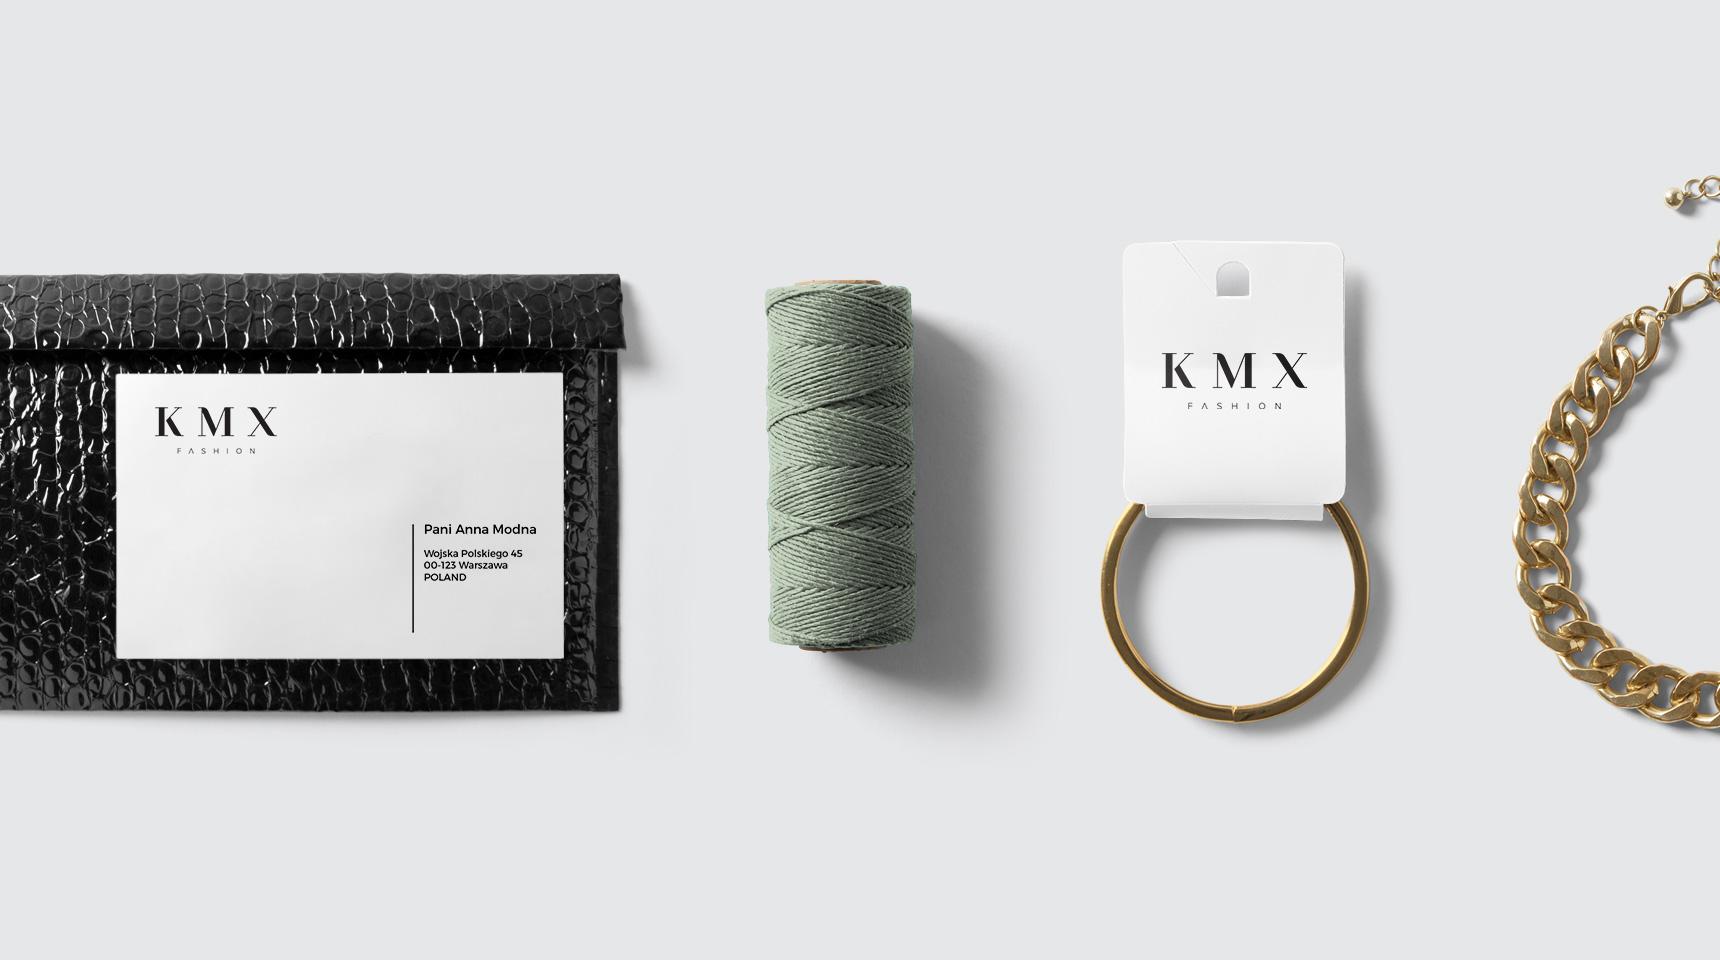 KMX Fashion - Classic, Sensual, Feminine...